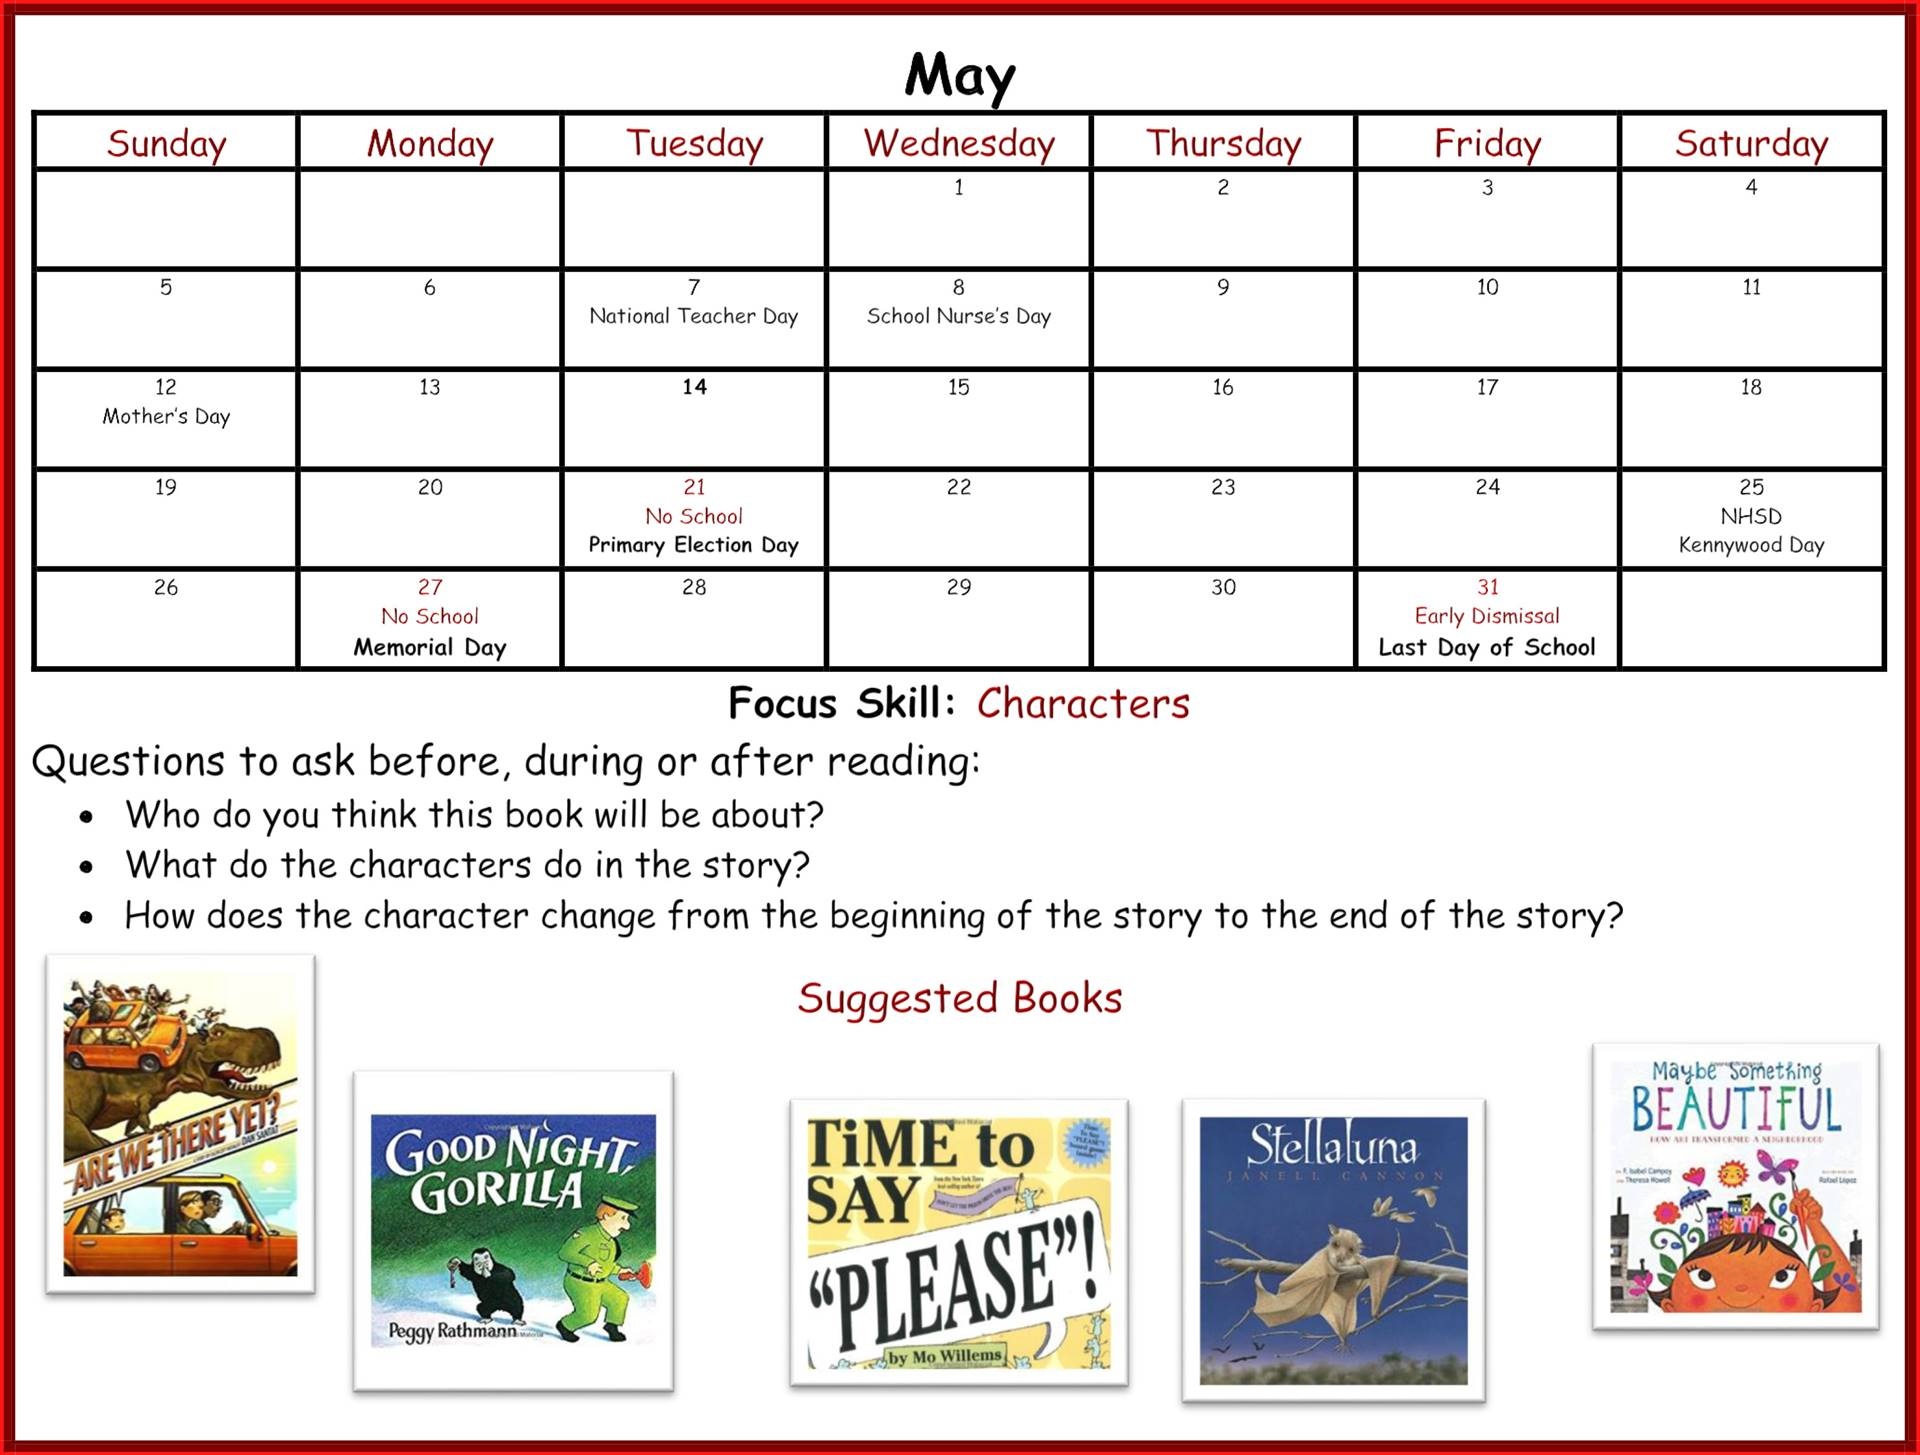 Kindergarten Readiness Calendar - May page 1